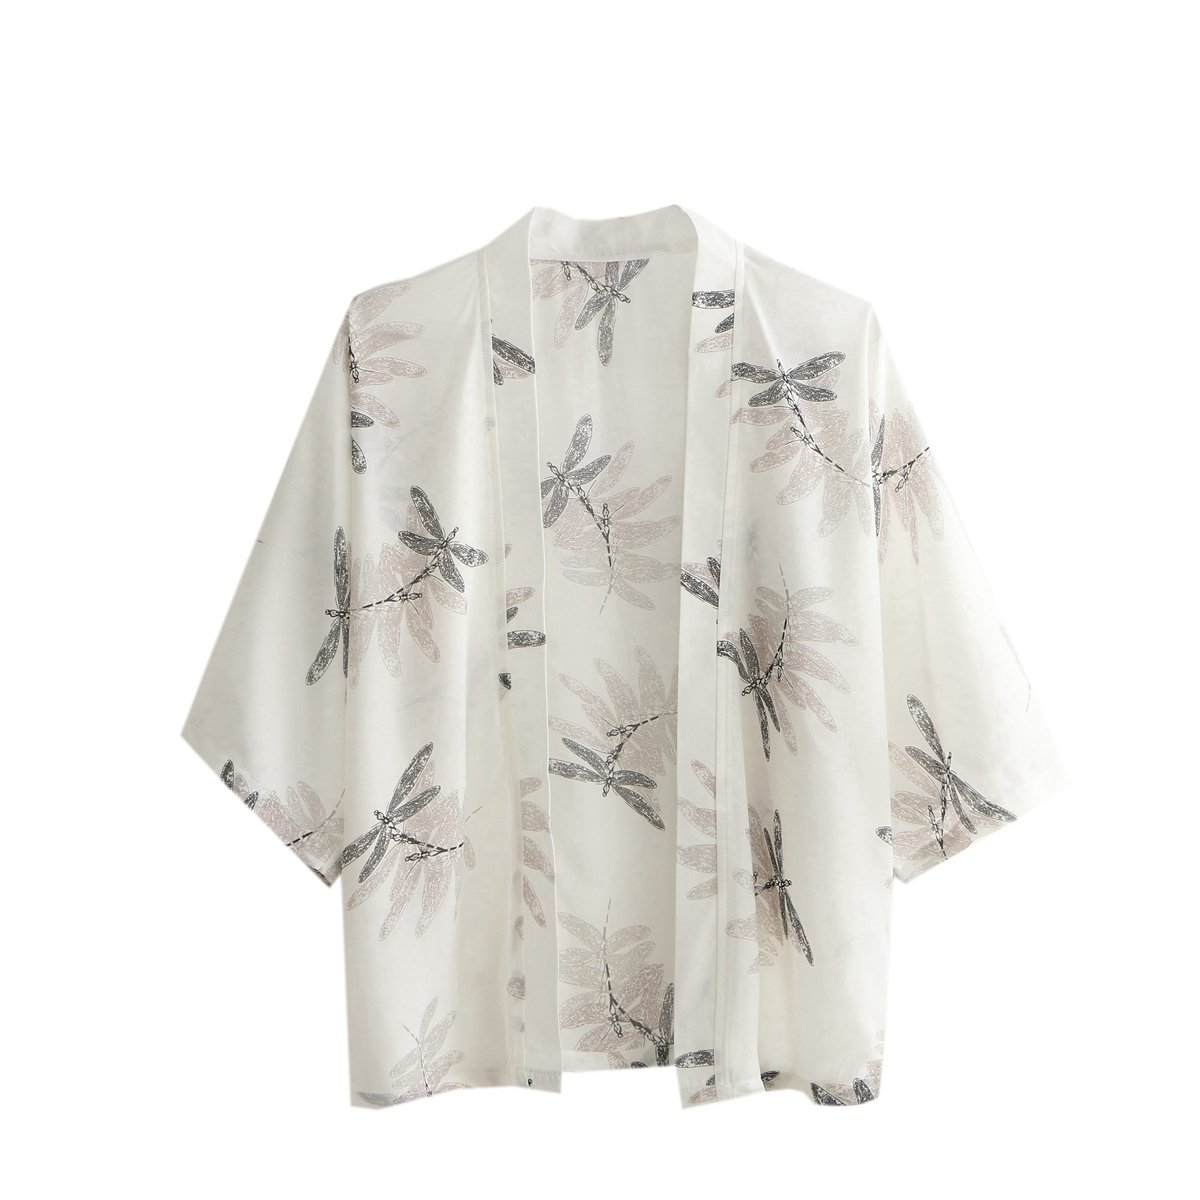 Japanese Style Women Chiffon Kimono 3/4 Sleeve Dragonfly Print Casual Blouse Coat Sun Protection Clothing (Free Size, C2)